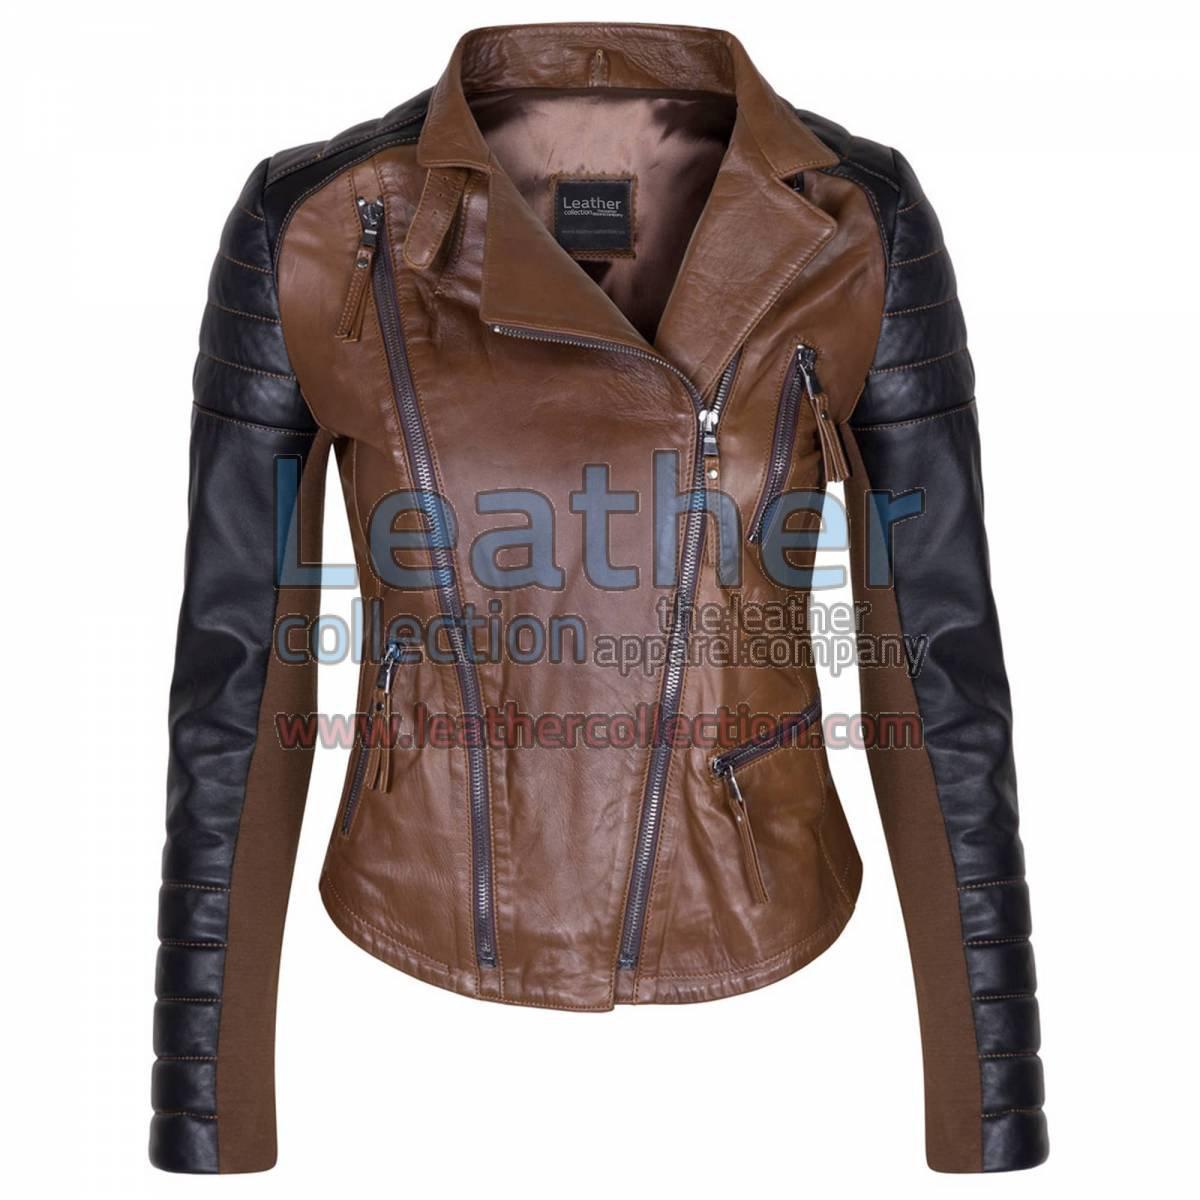 Kelly Ladies Fashion Leather Jacket Black & Brown